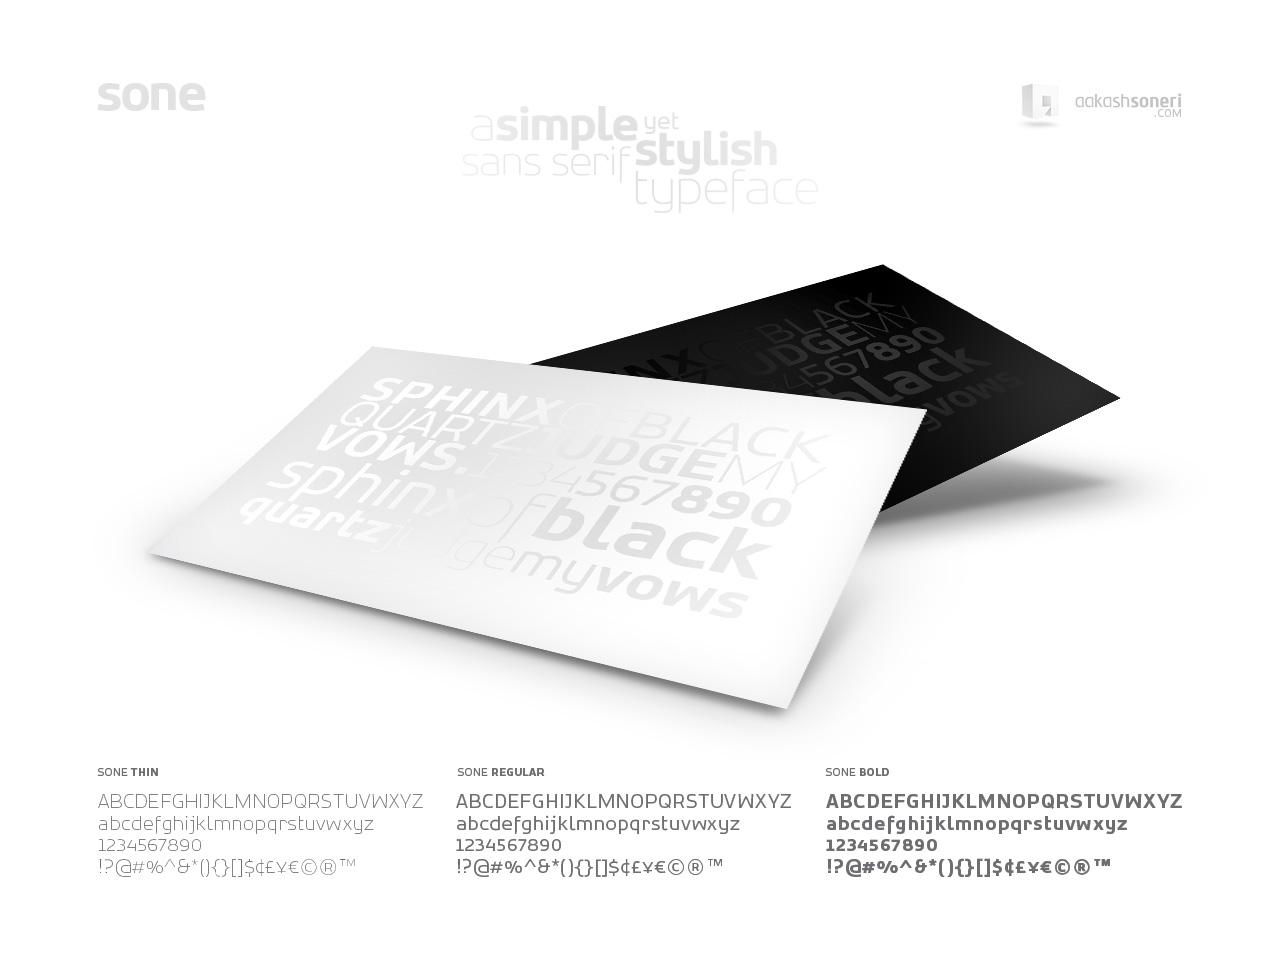 SONE Typeface Family by akkasone